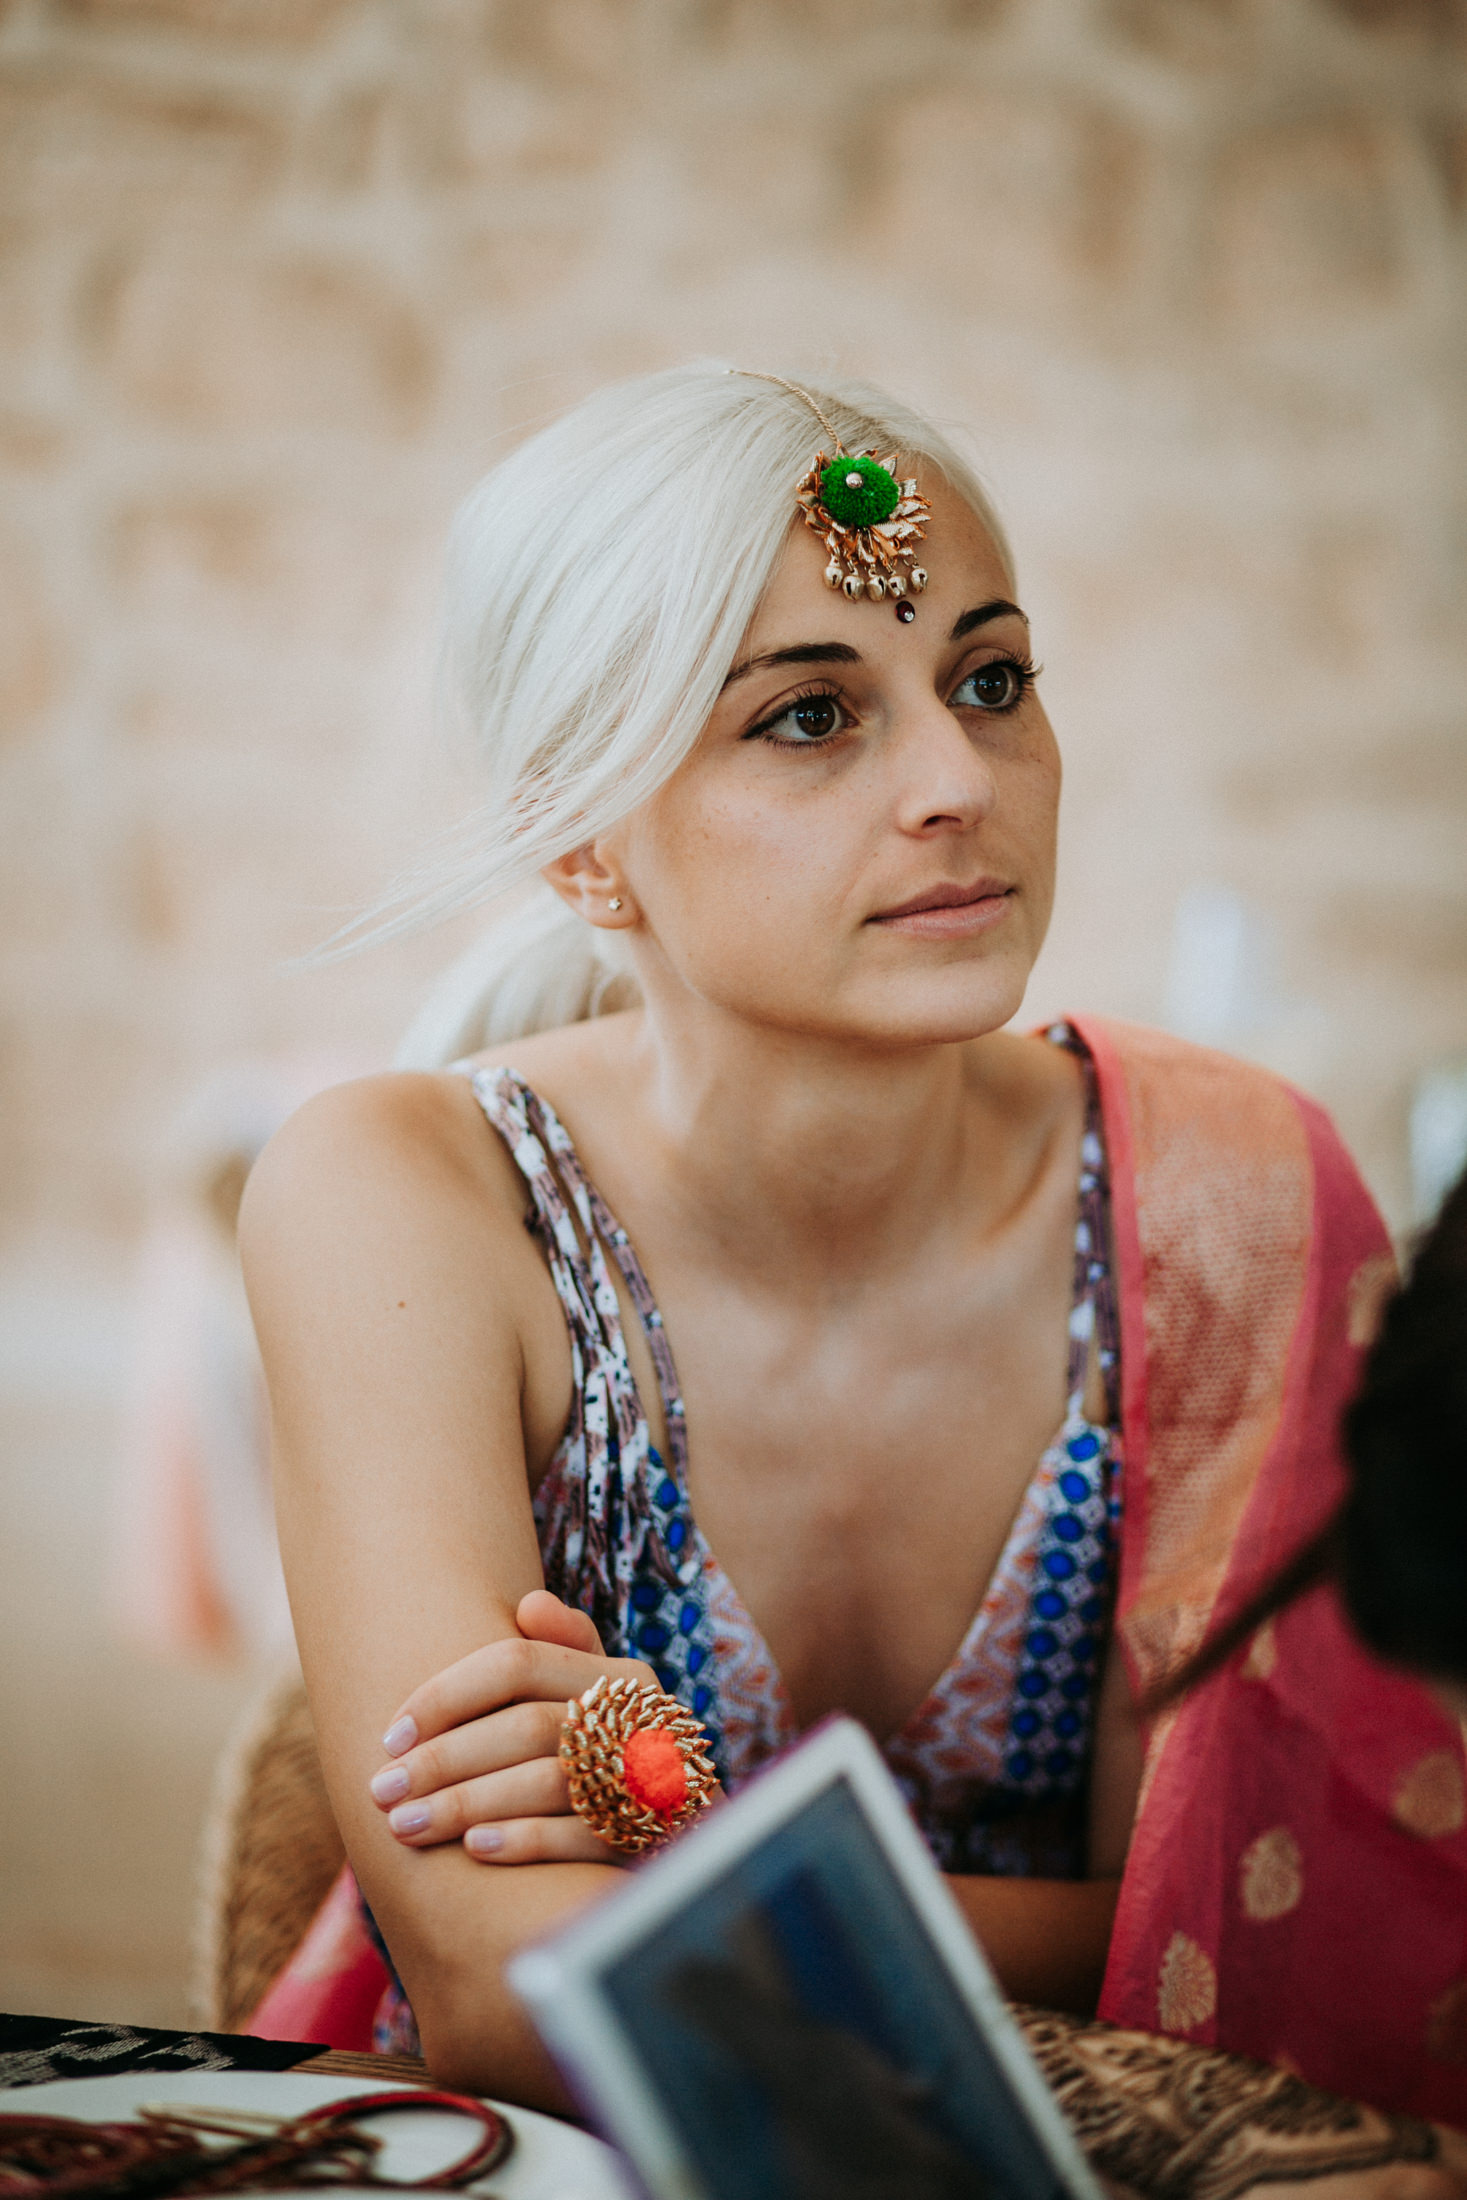 Wedding_Photographer_Mallorca_Daniela-Marquardt_Photography_New_York_Iceland_Tuscany_Santorini_Portugal_Austria_Bavaria_Elopement_Hochzeitsfotograf_AntjeRajat1_26